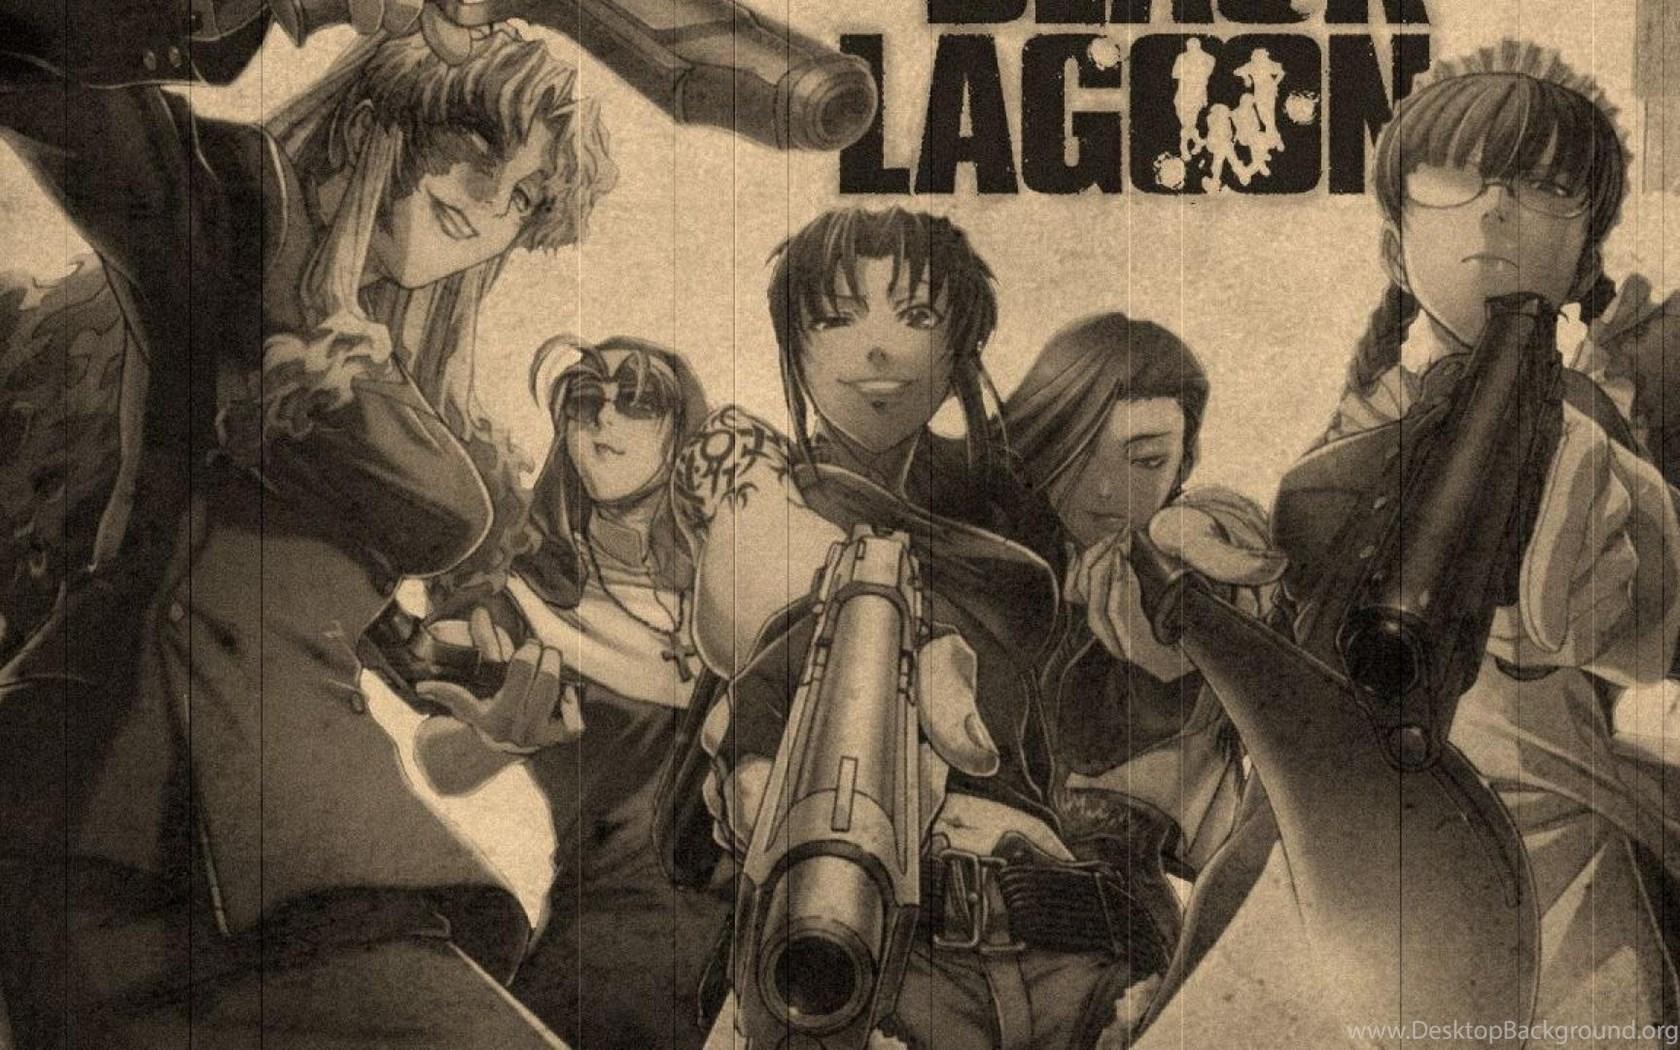 Anime Retro Wallpaper Desktop - WallpaperShit